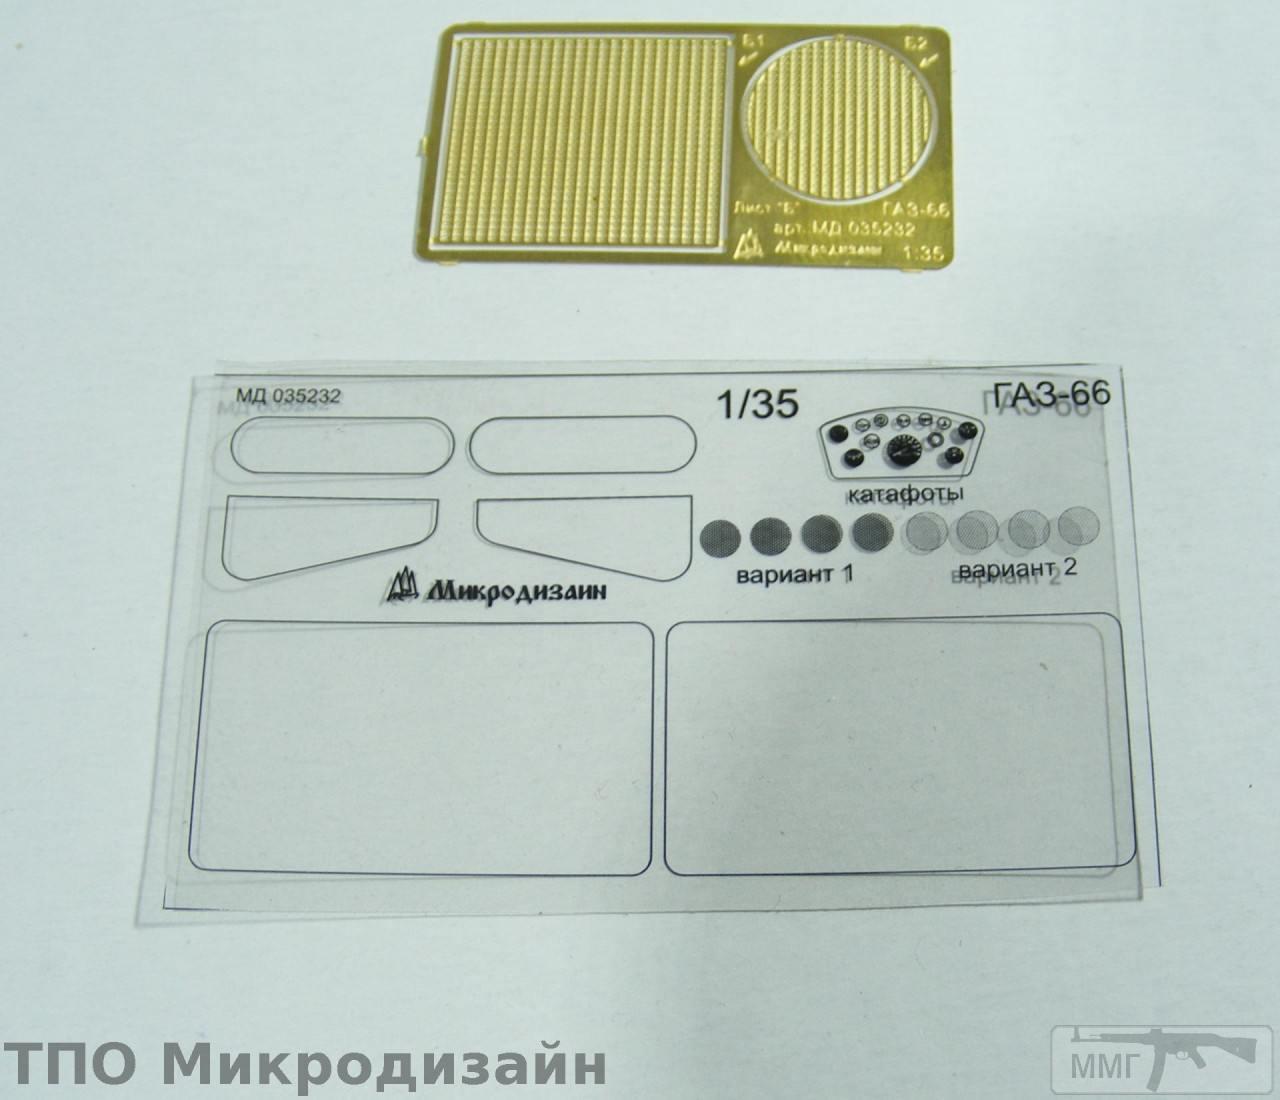 54565 - Обзор моделей и афтемаркета.